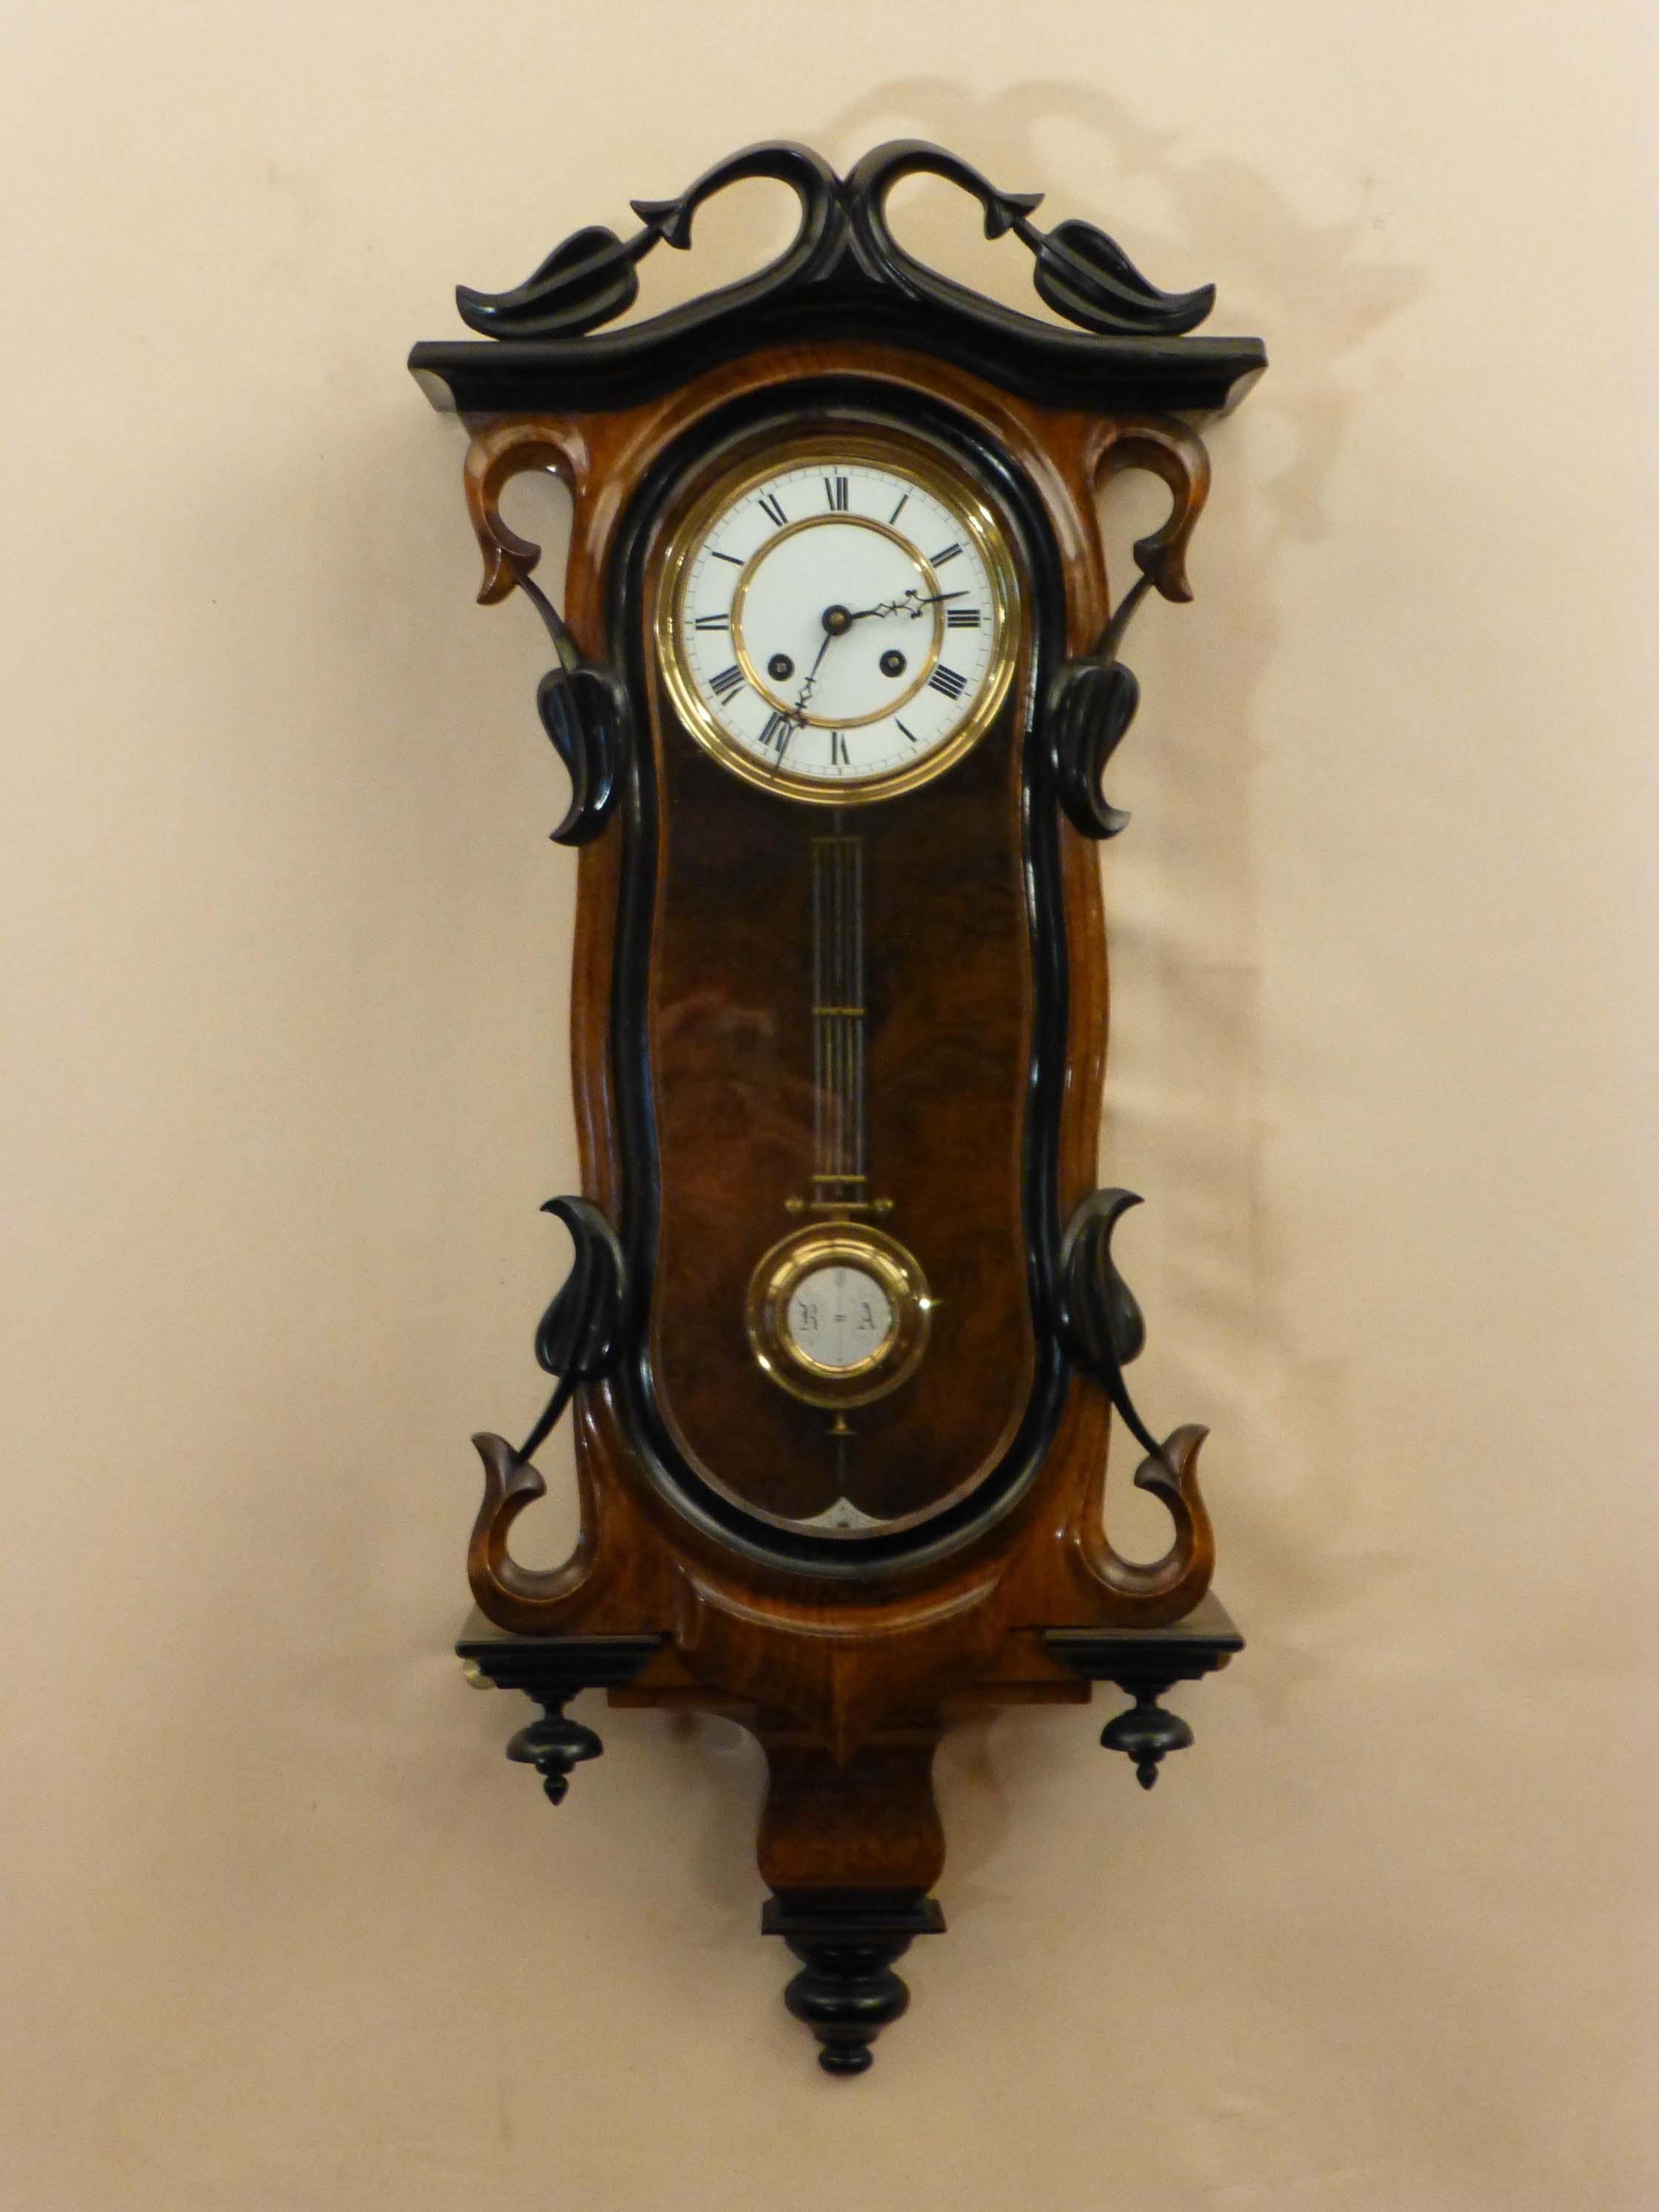 Bright Art Nouveau Wall Clock 68 Art Deco Style Wall Clocks Uk Throughout Art Deco Wall Clocks (Image 11 of 20)